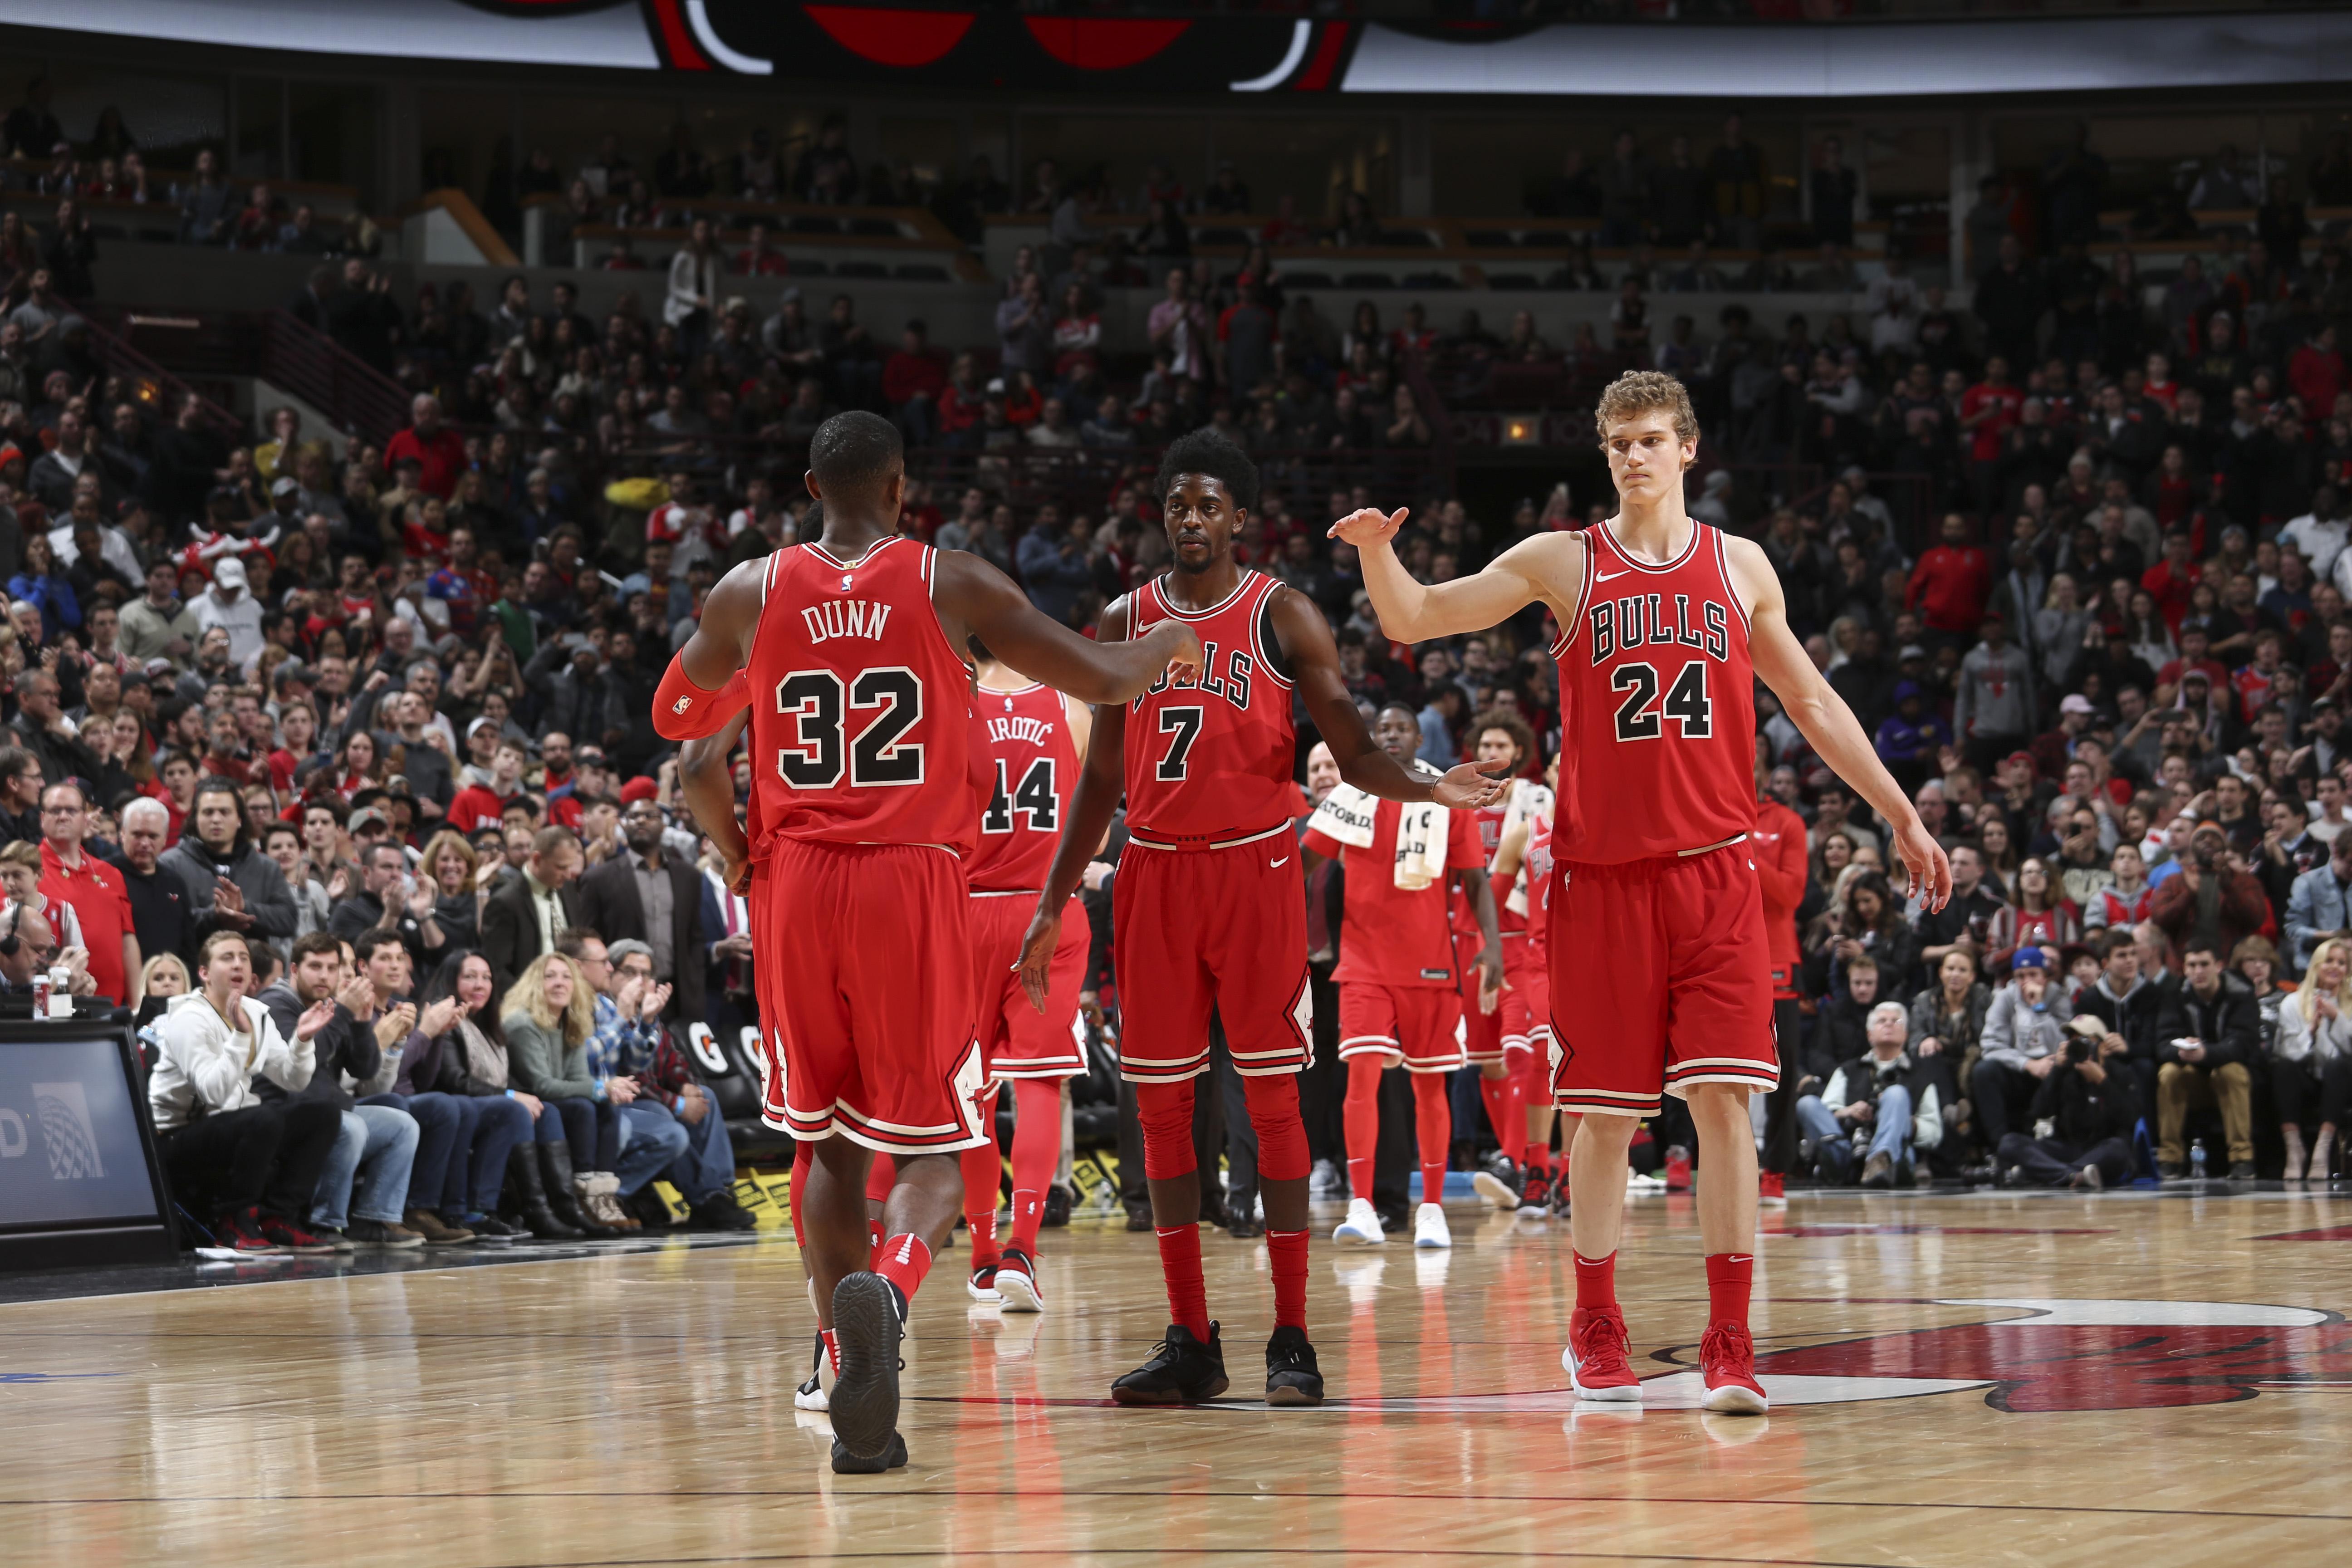 Blog a Bull, a Chicago Bulls community